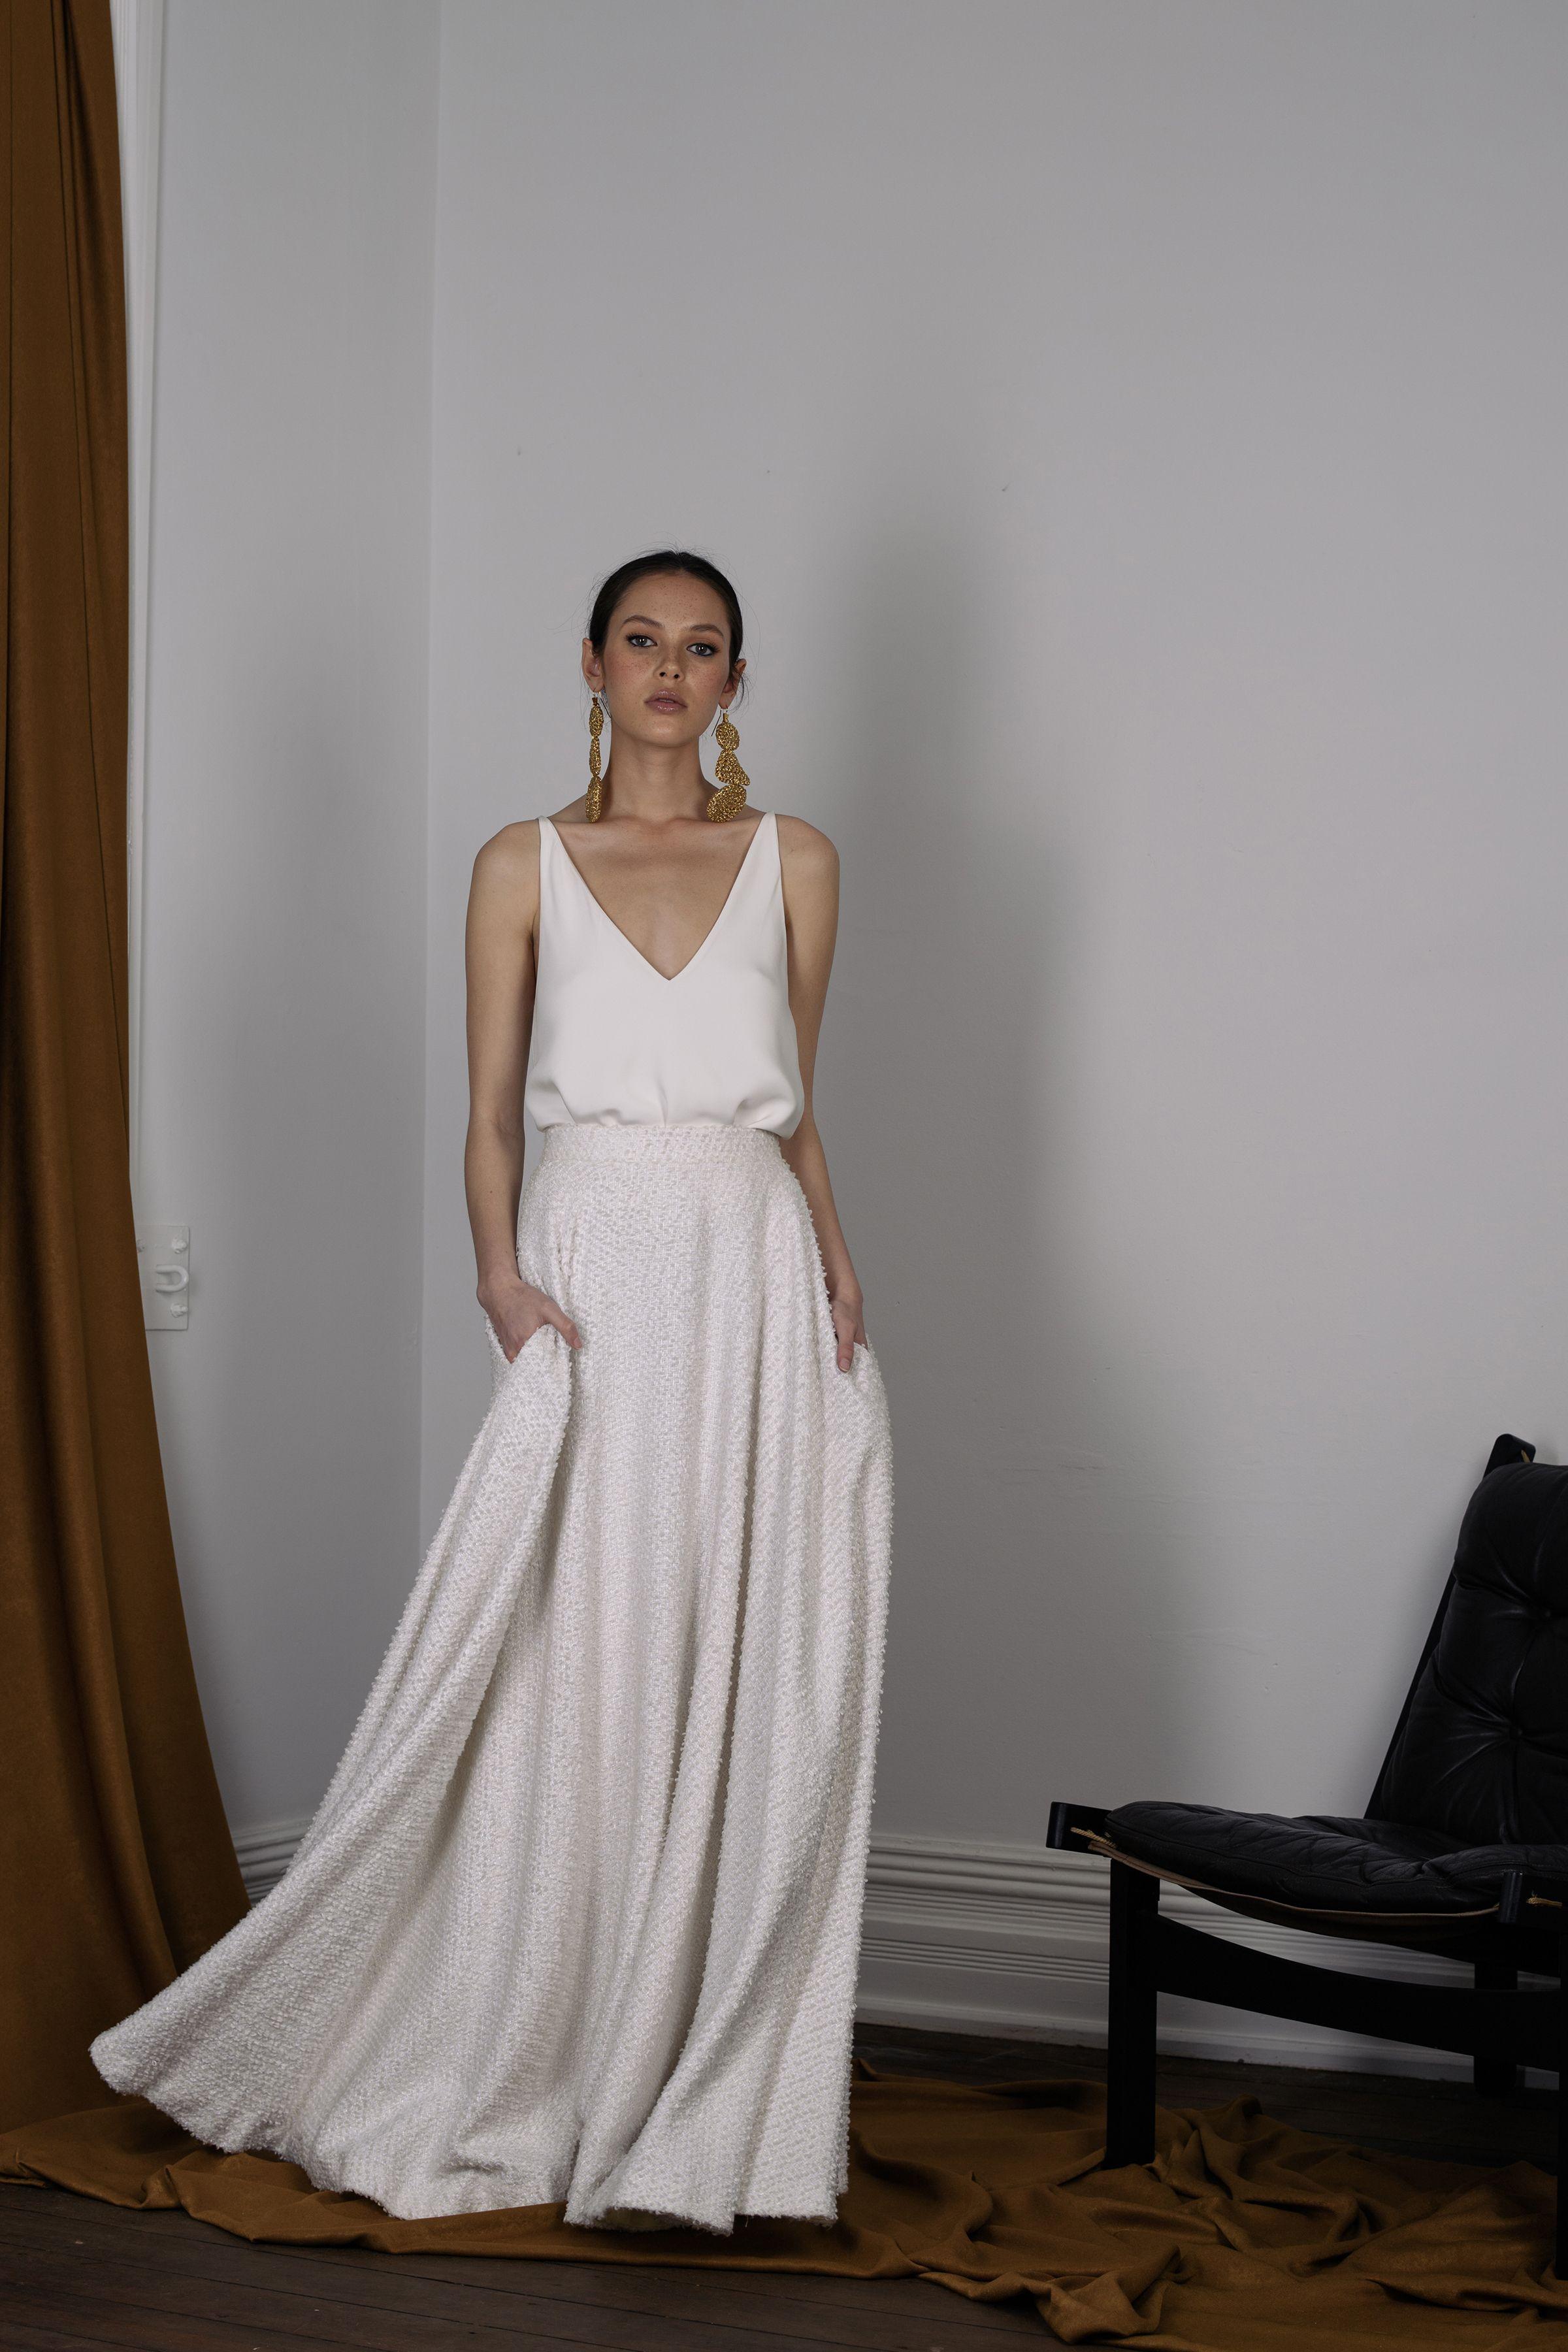 Plus size pin up style wedding dress  Pula Skirt  Lacey  Pinterest  Dresses Skirts and Wedding dresses